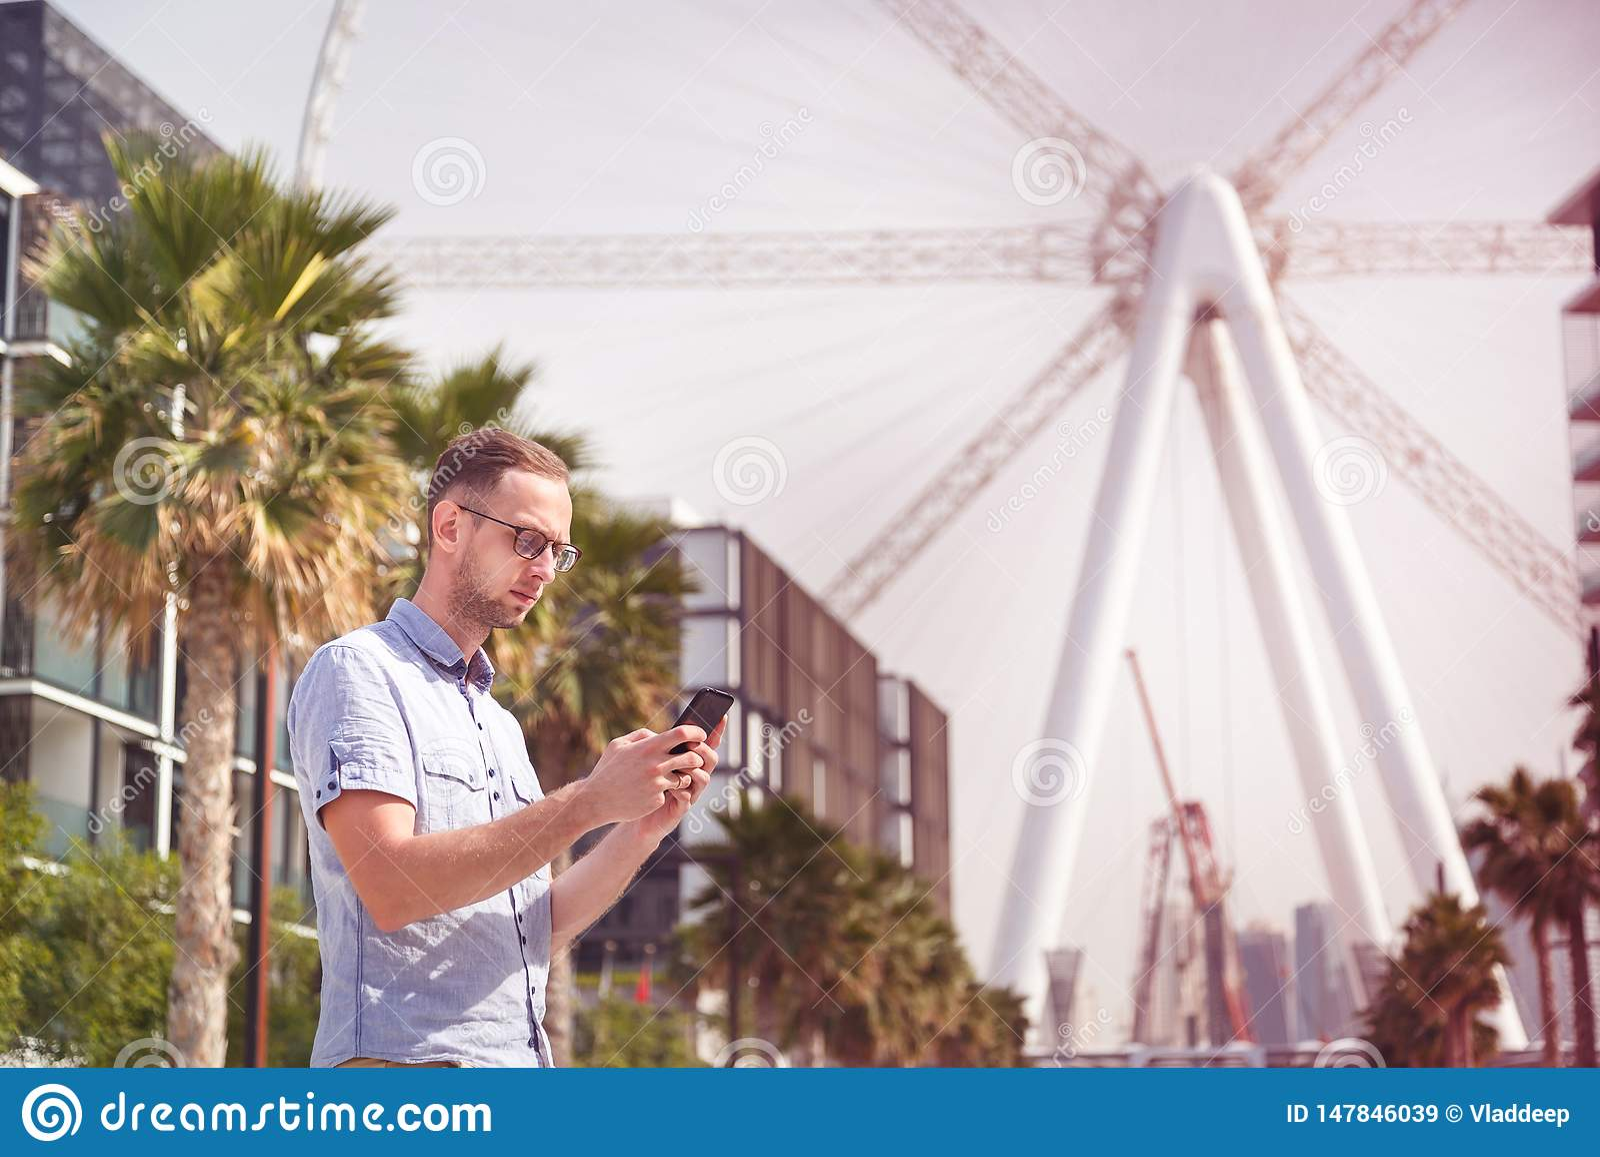 Young man in eyeglasses using his phone in Dubai